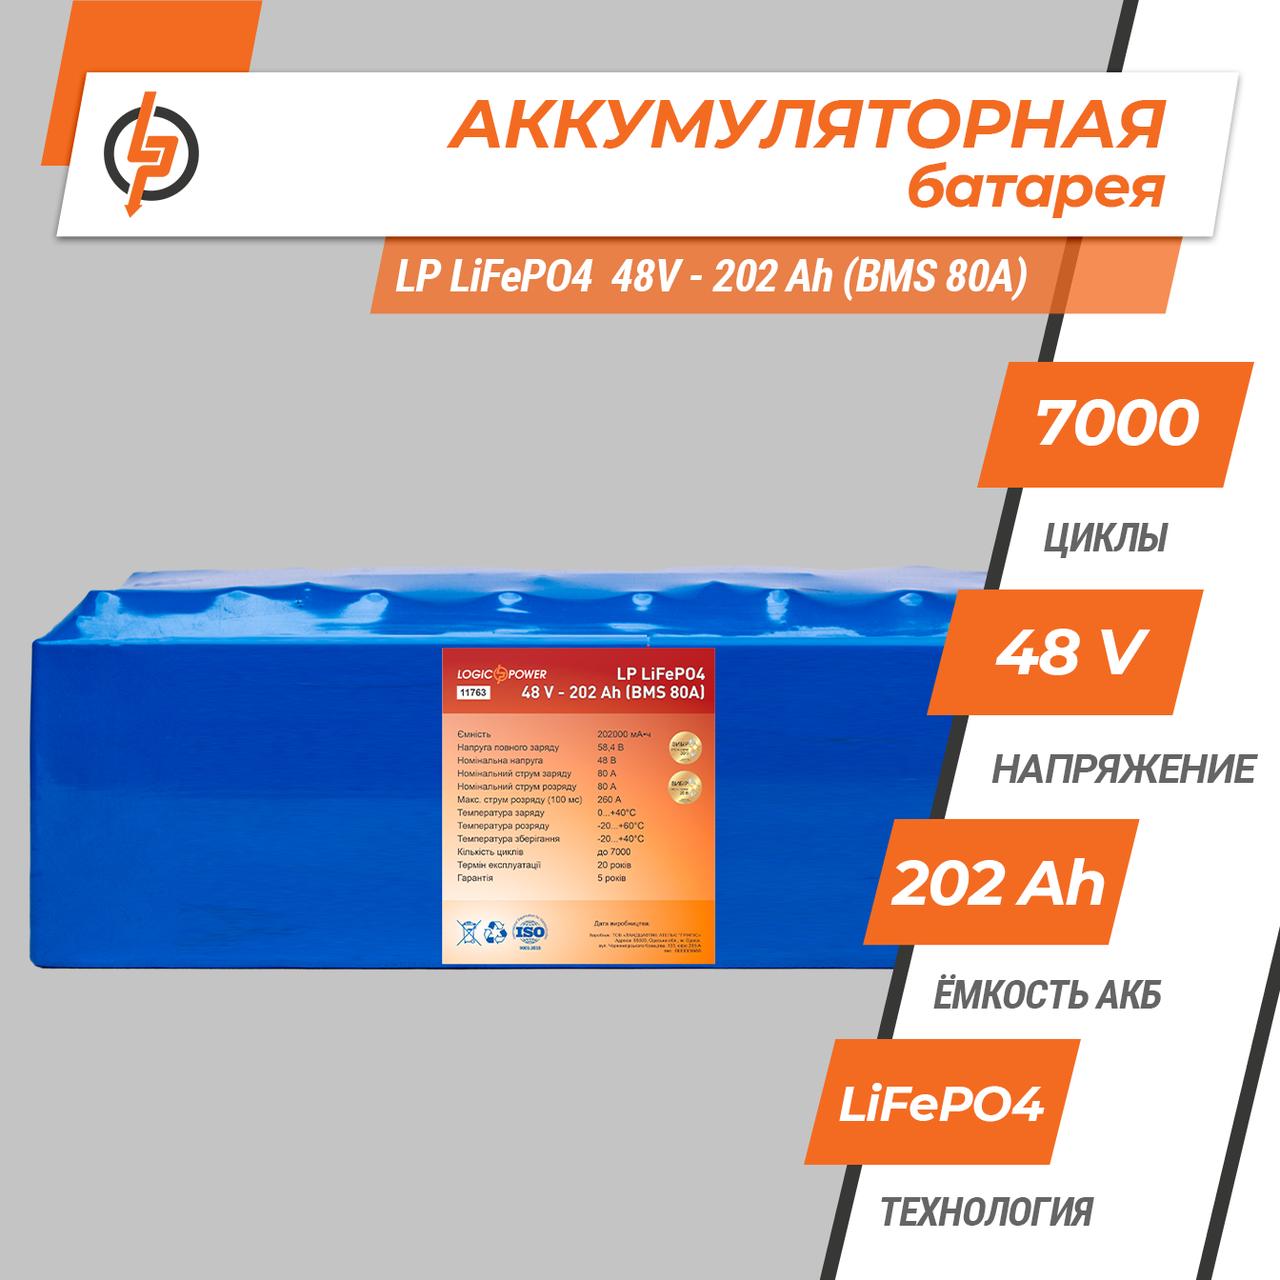 Акумулятор LP LiFePo-4 48 V 202 Ah BMS 80A